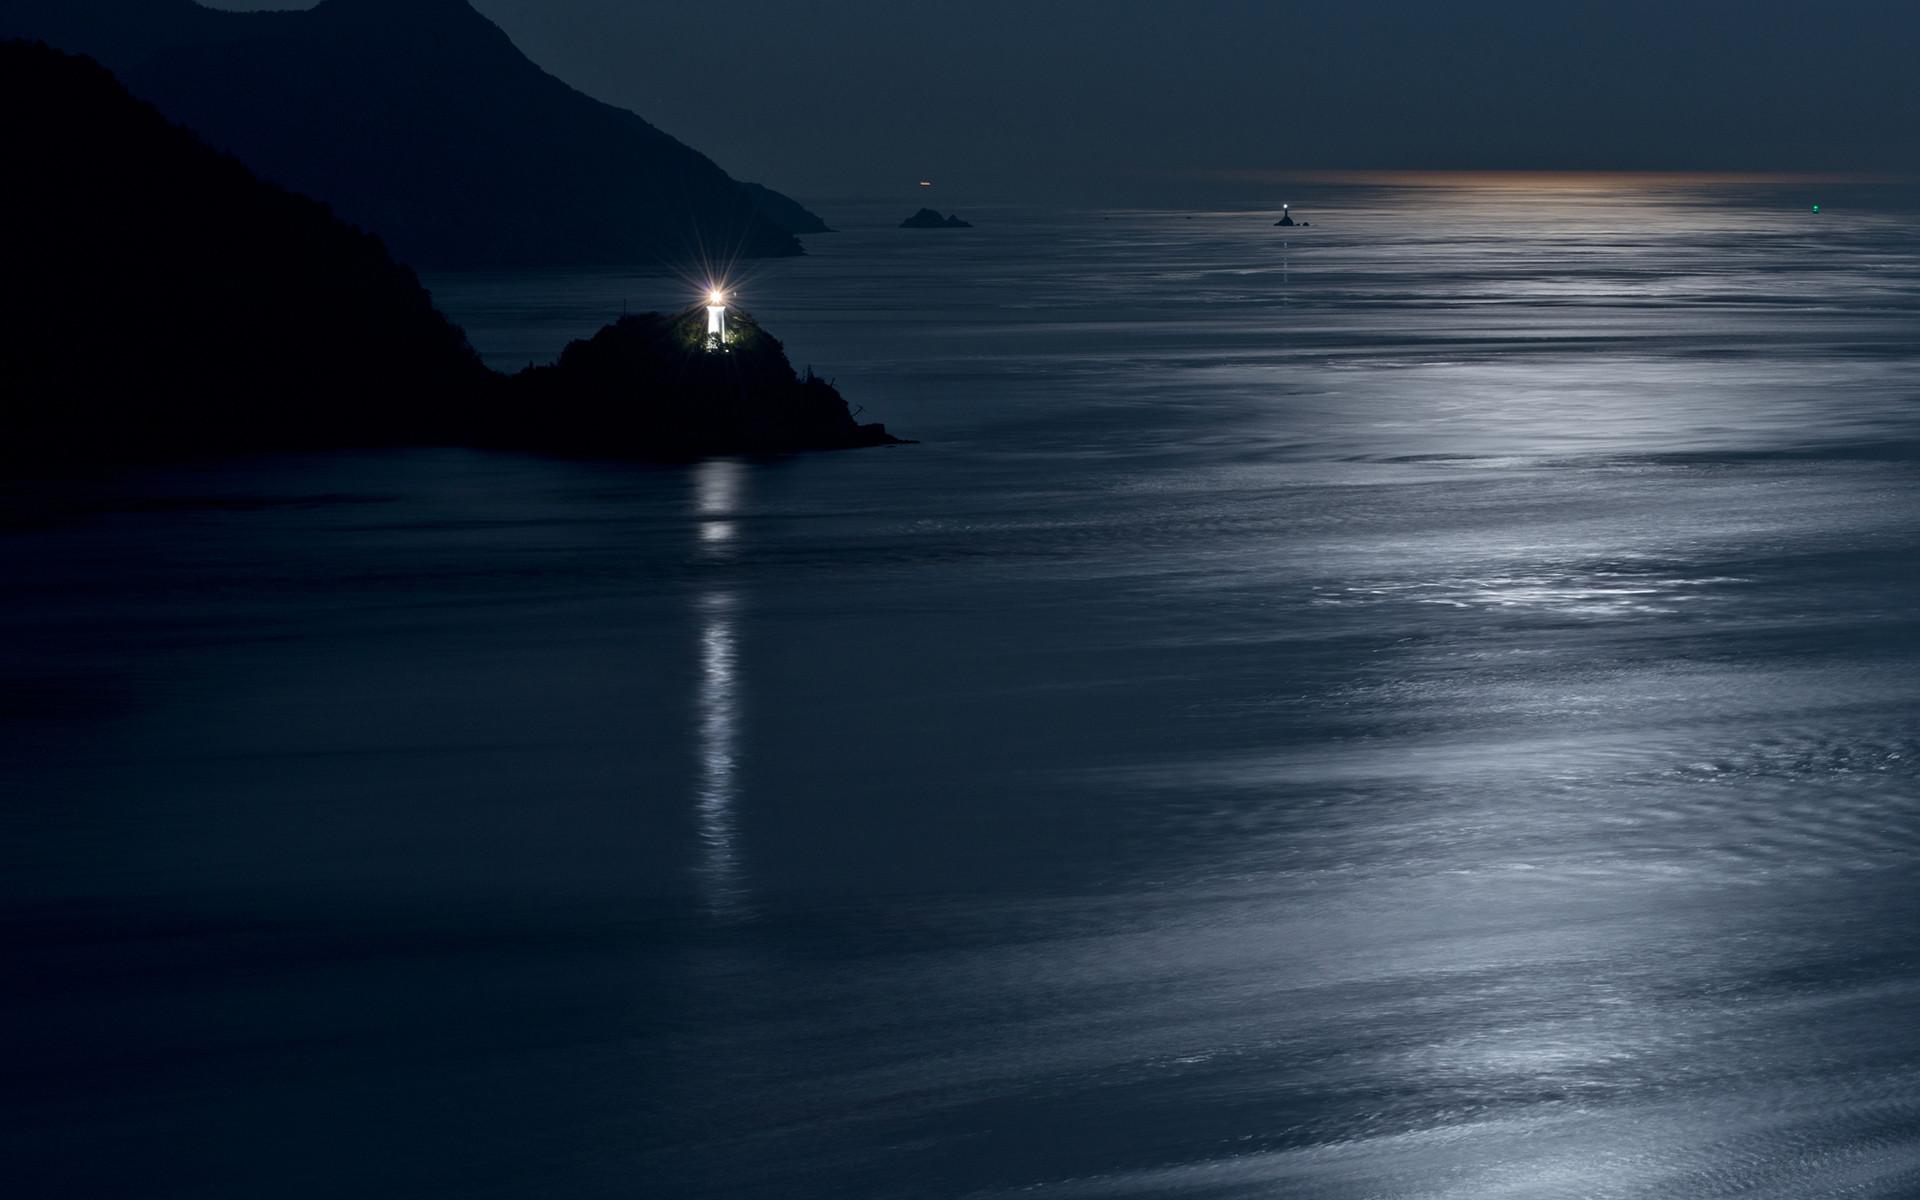 Lighthouse Coast night ocean sea reflection moon moonlight lights scenic  shore mood wallpaper     110720   WallpaperUP